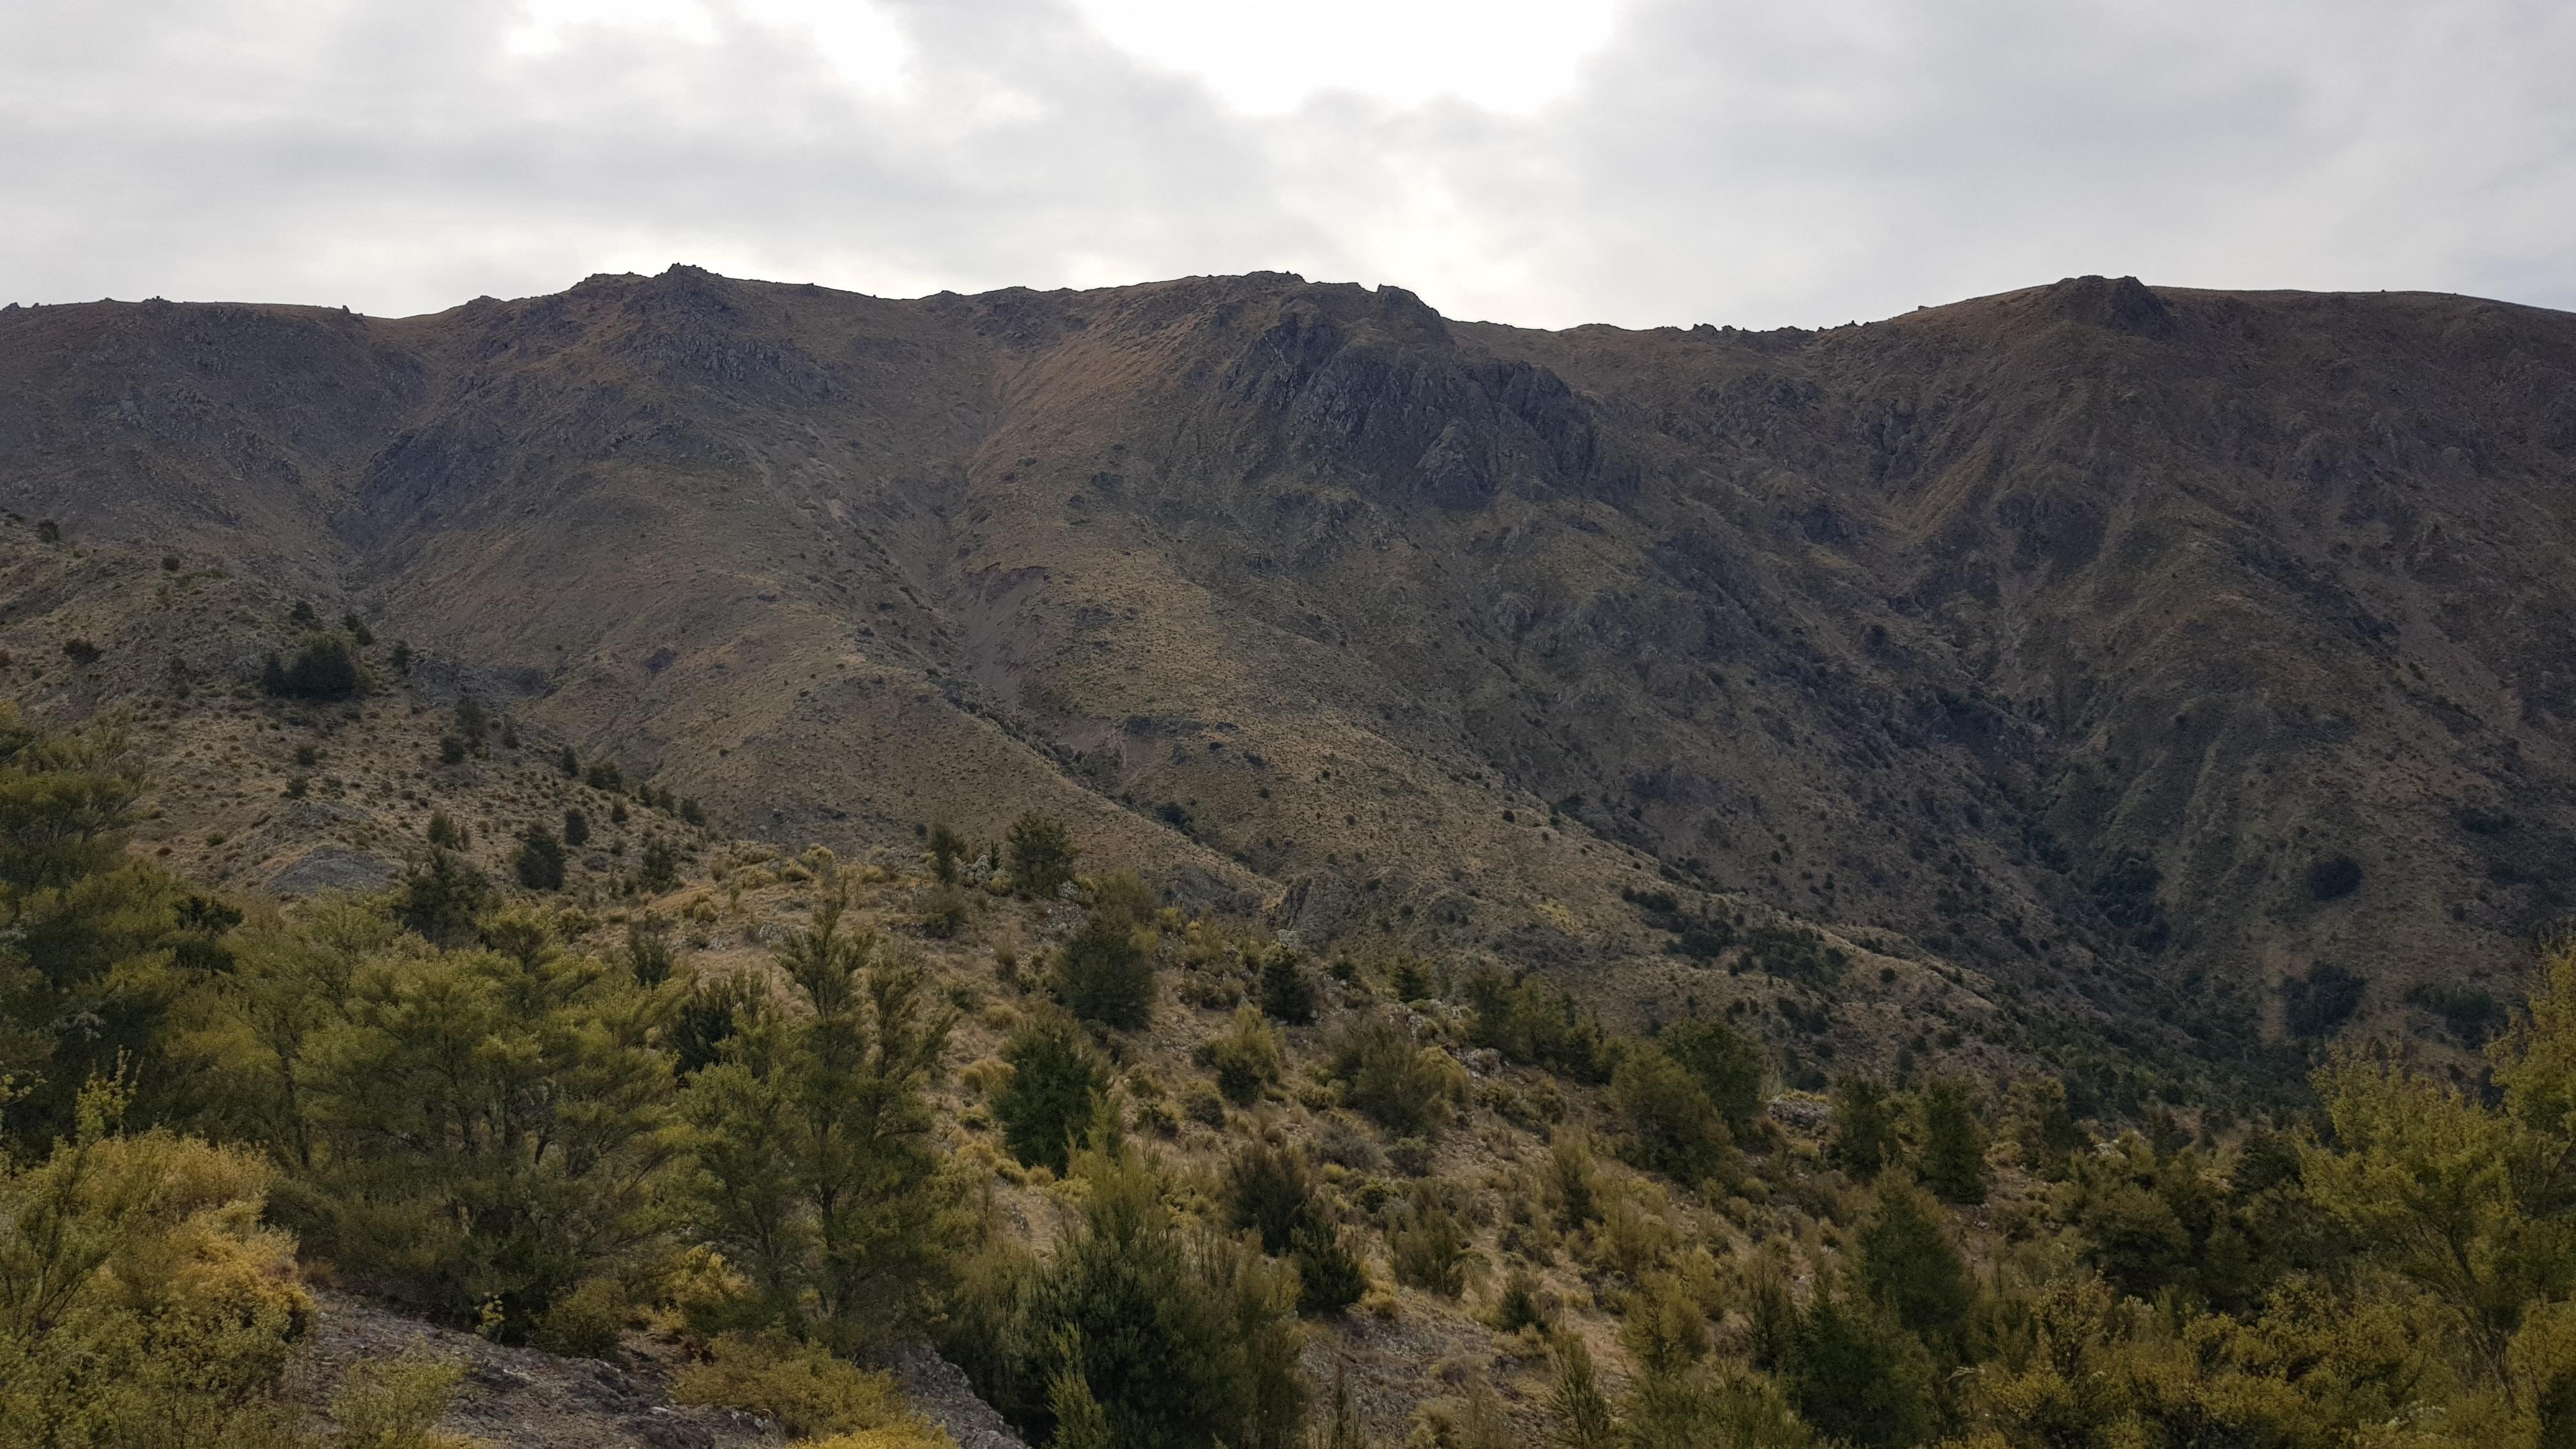 The Blairich Range